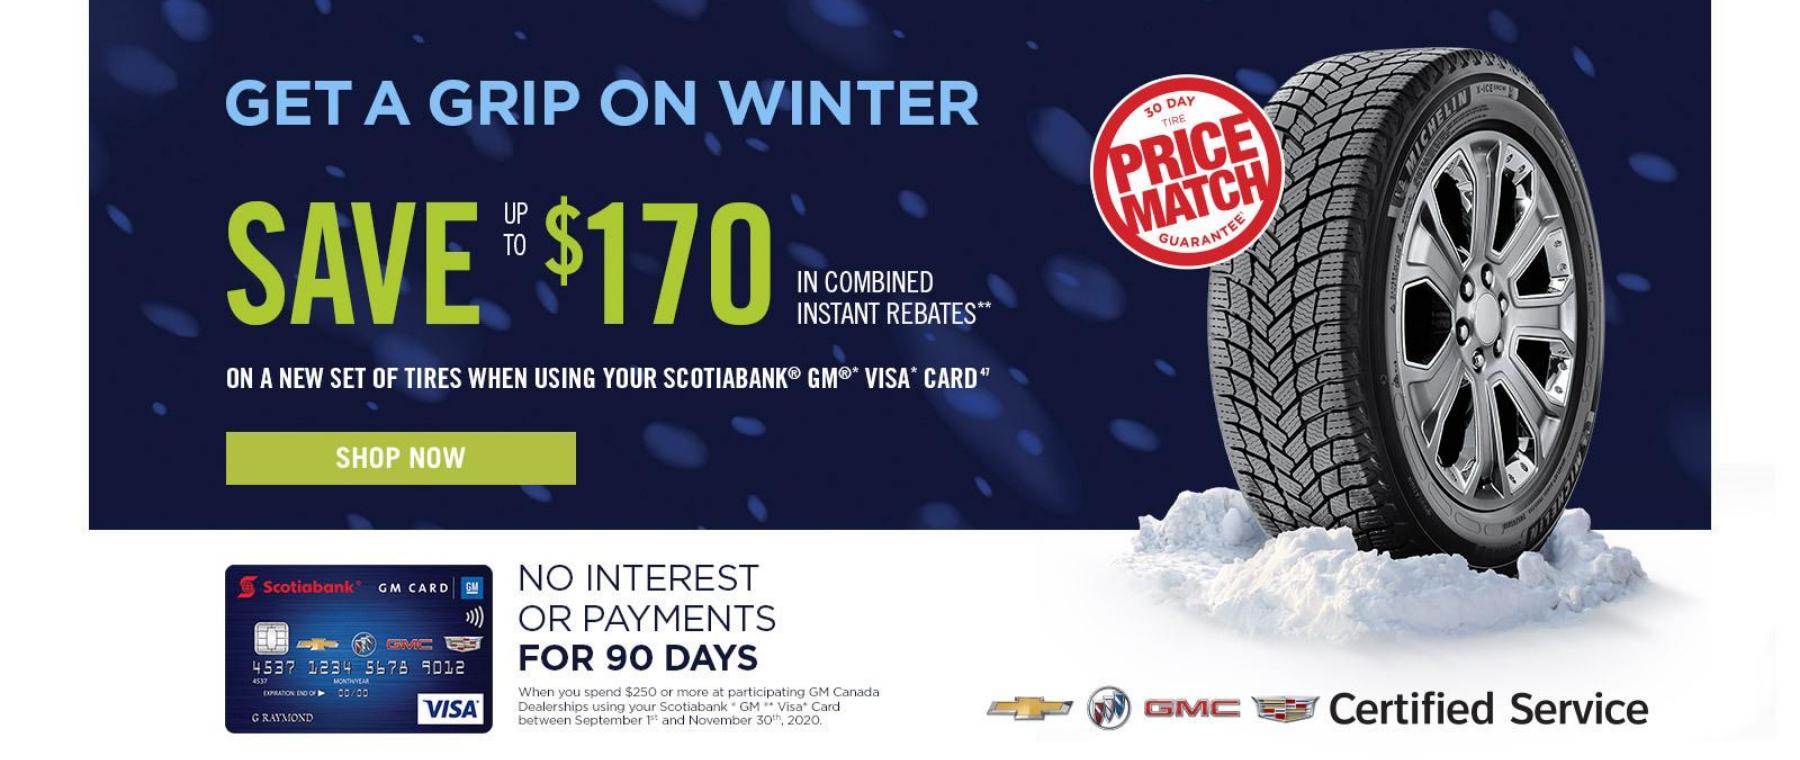 Get a Grip On Winter - $170 Rebates